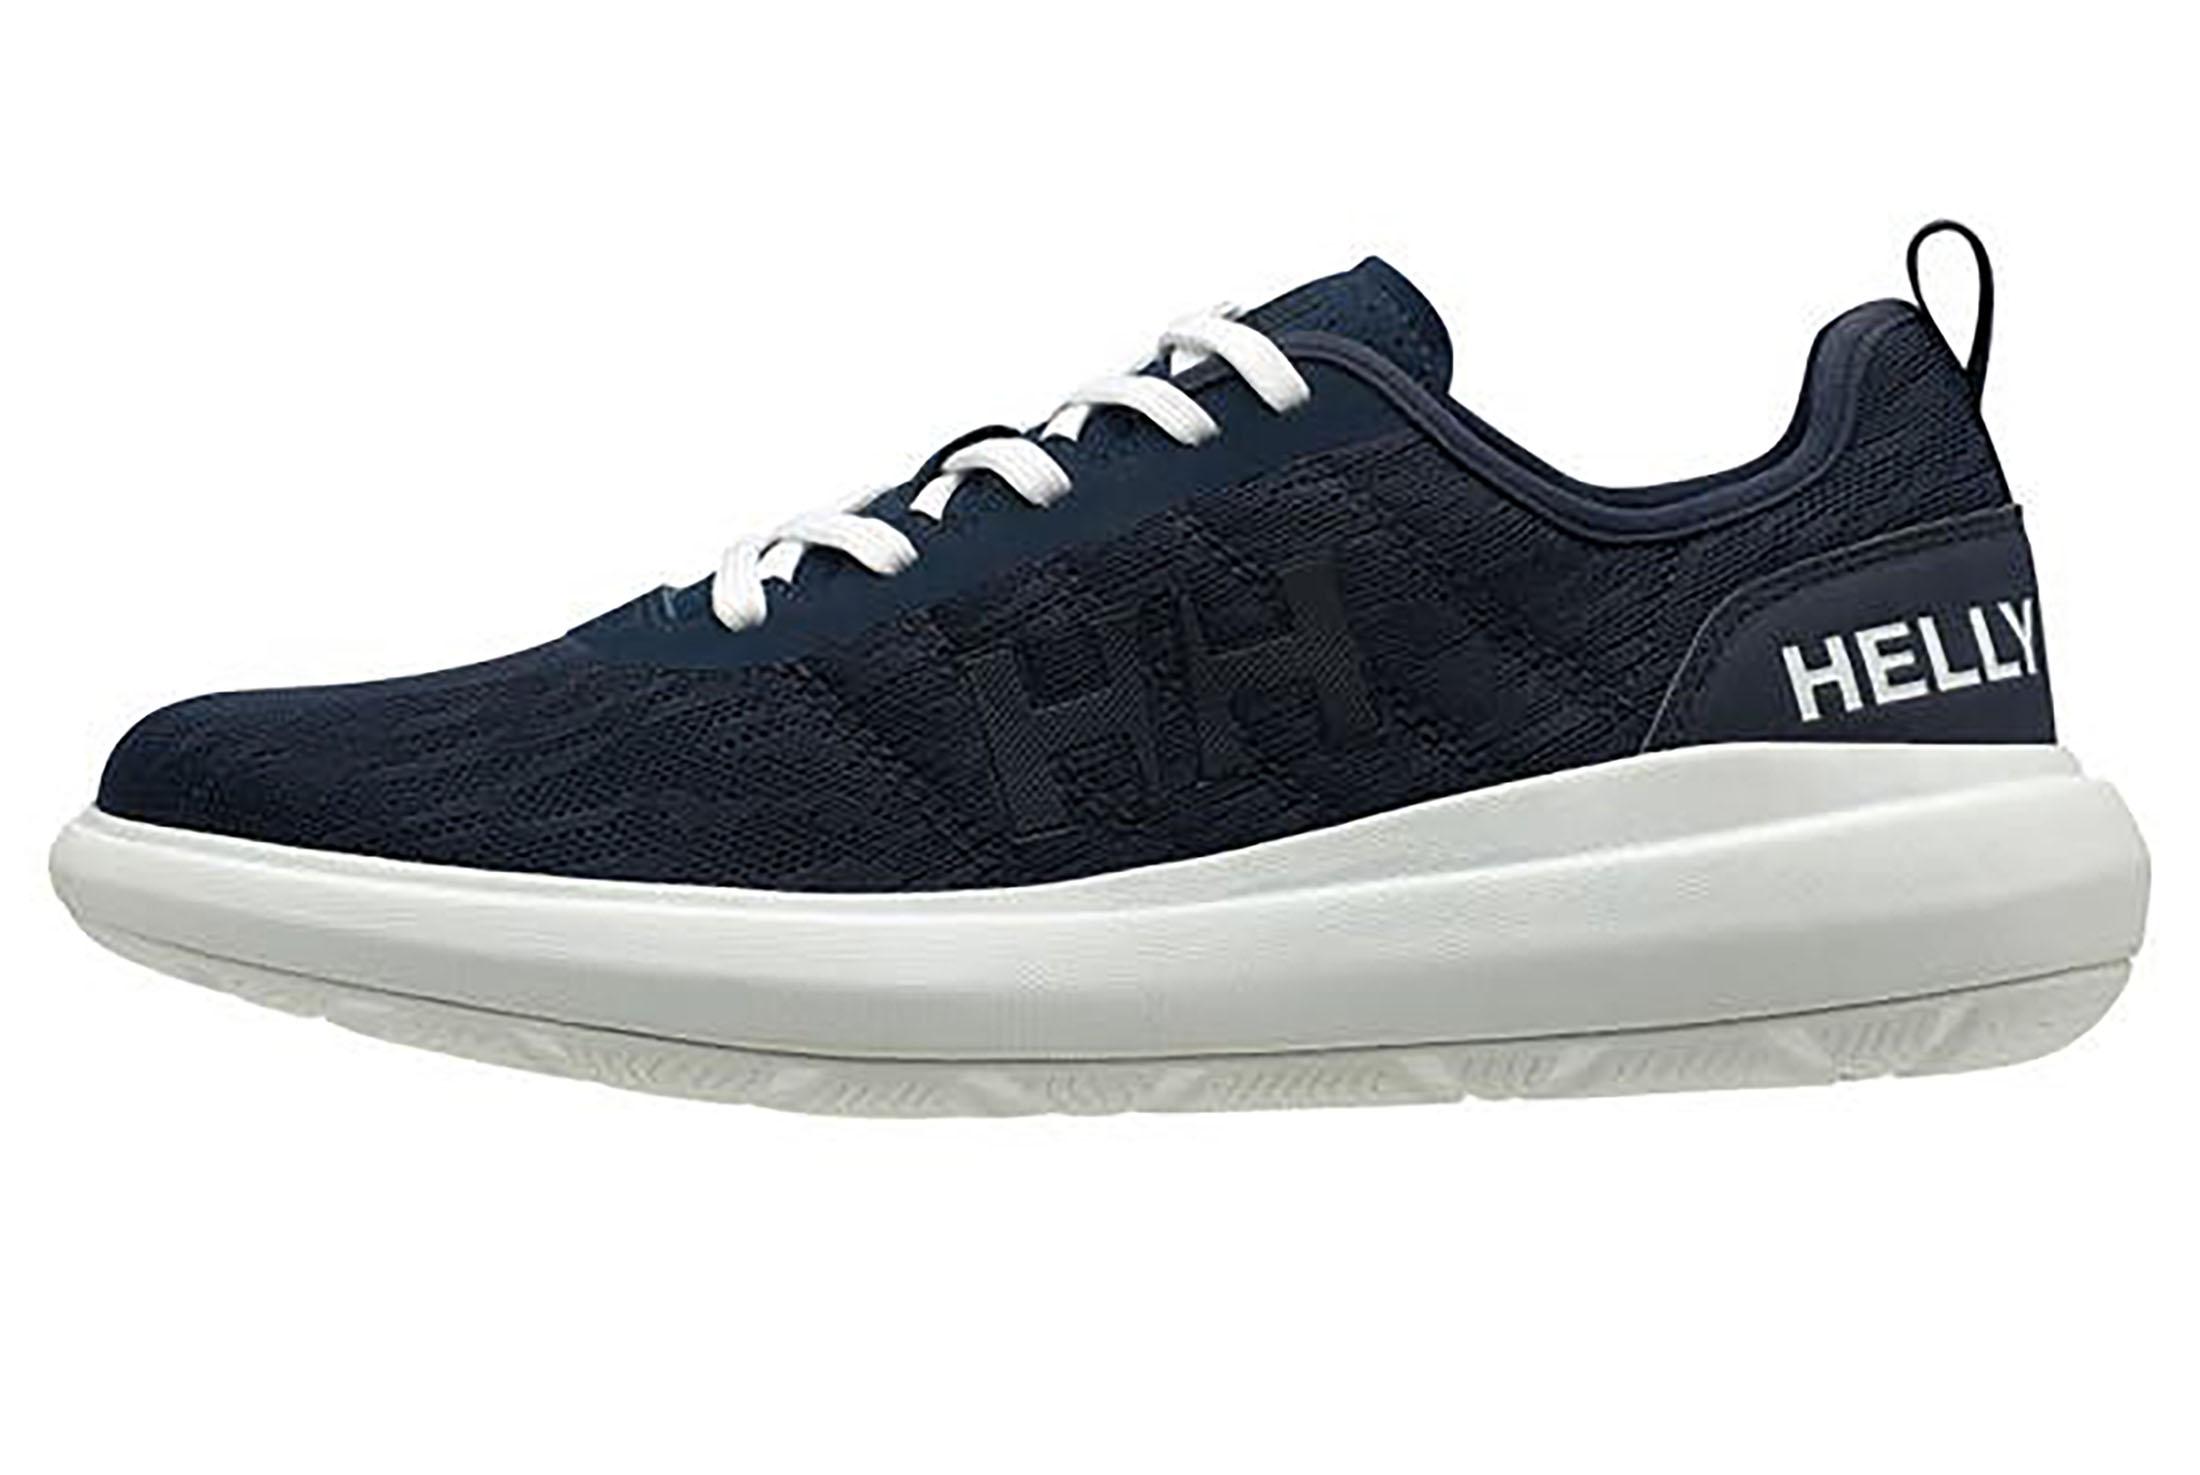 Helly Hansen Spindrift Shoe